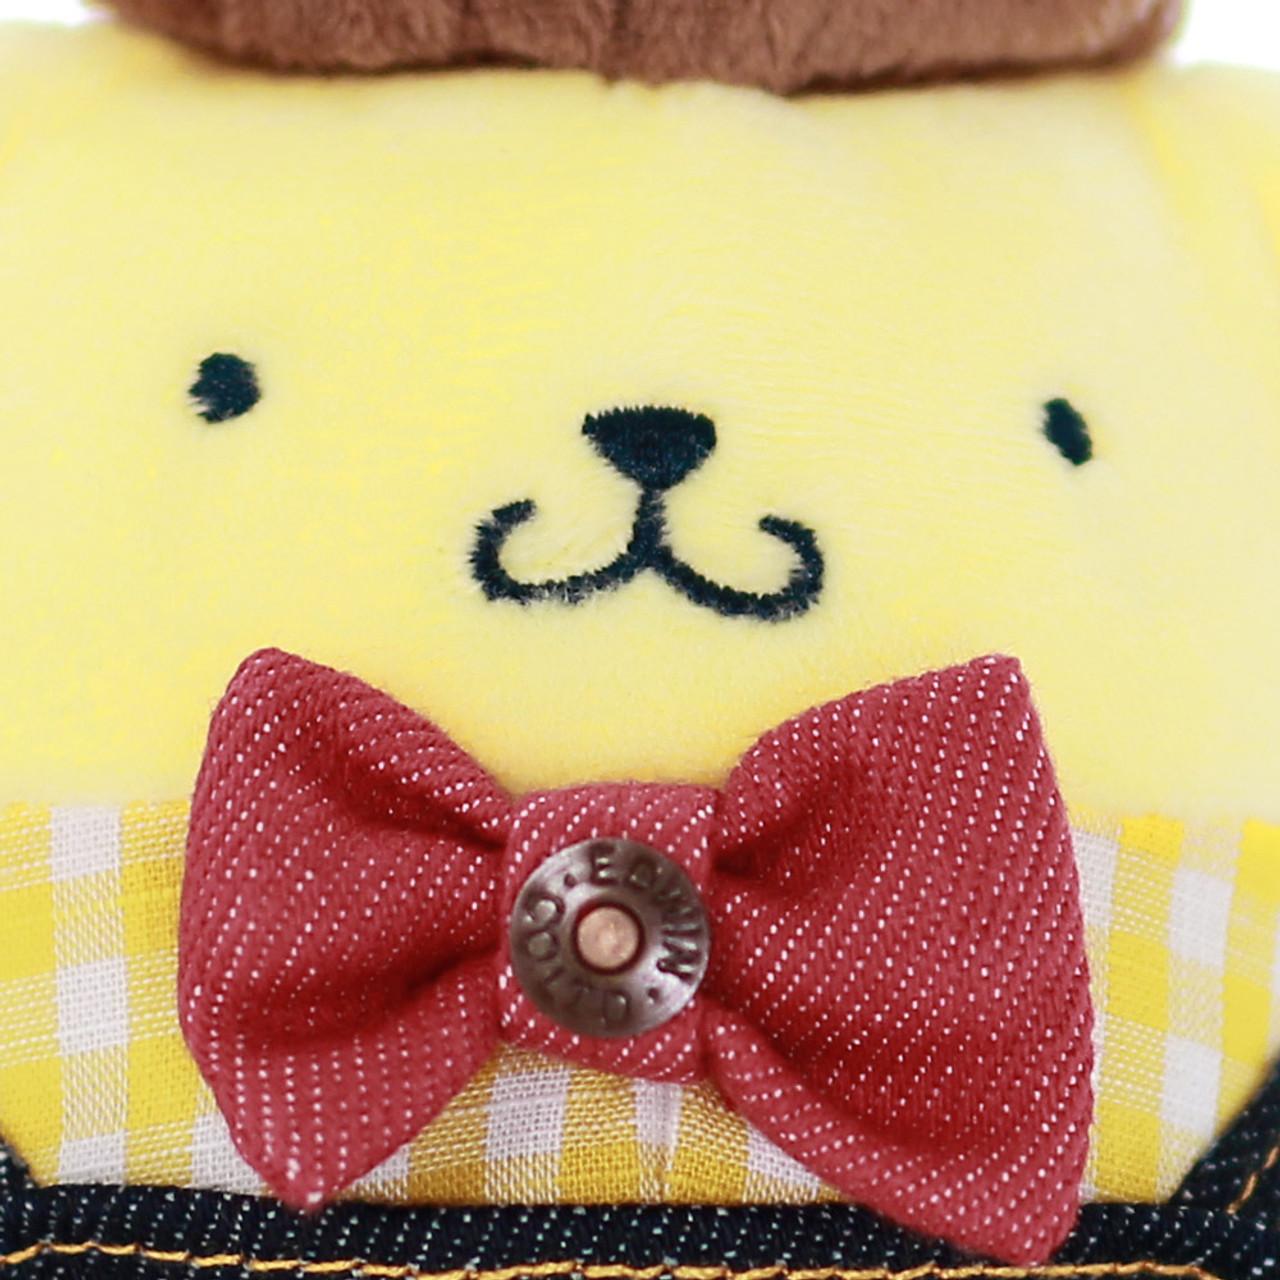 Sanrio PomPomPurin x Edwin Denim Dungarees Stuffed Animal Toy ( Bowtie Close-up )